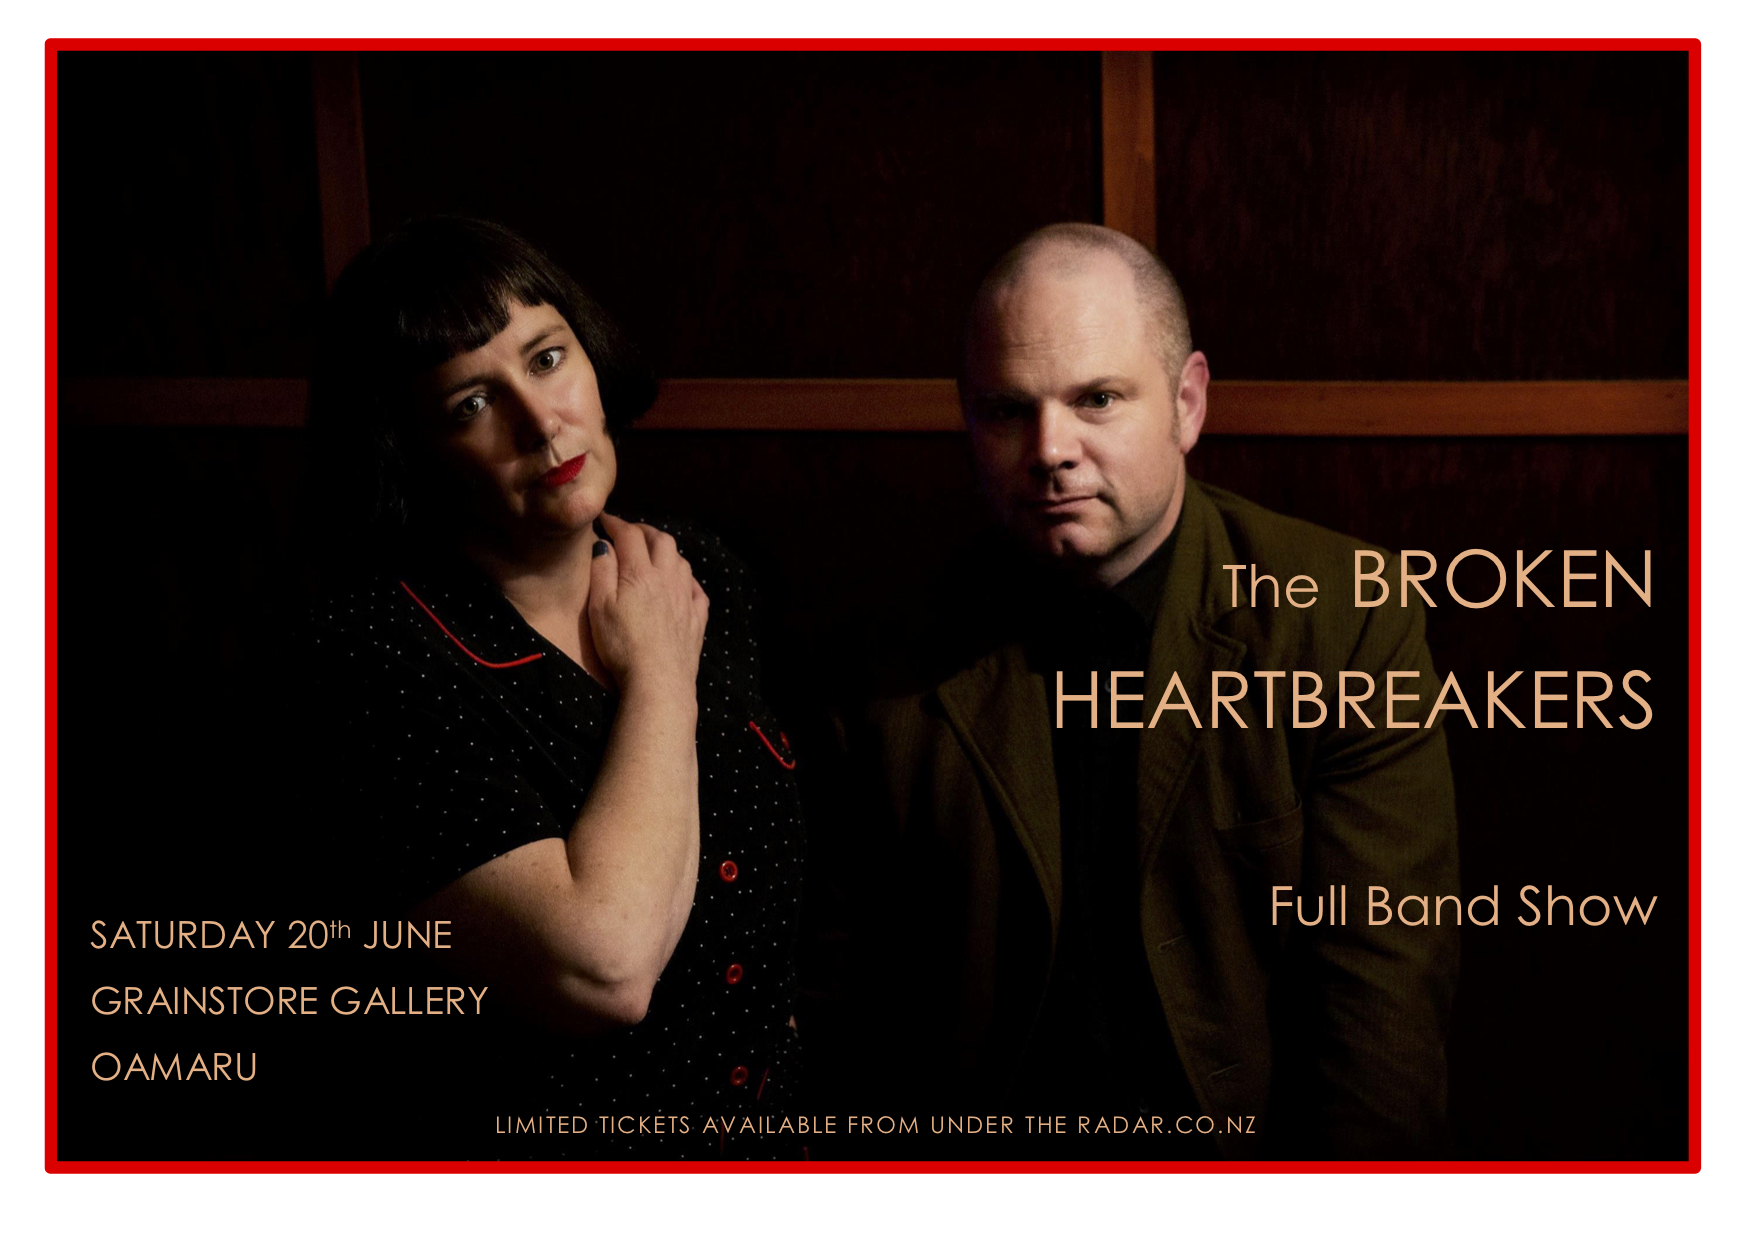 The Broken Heartbreakers Live Full Band Show